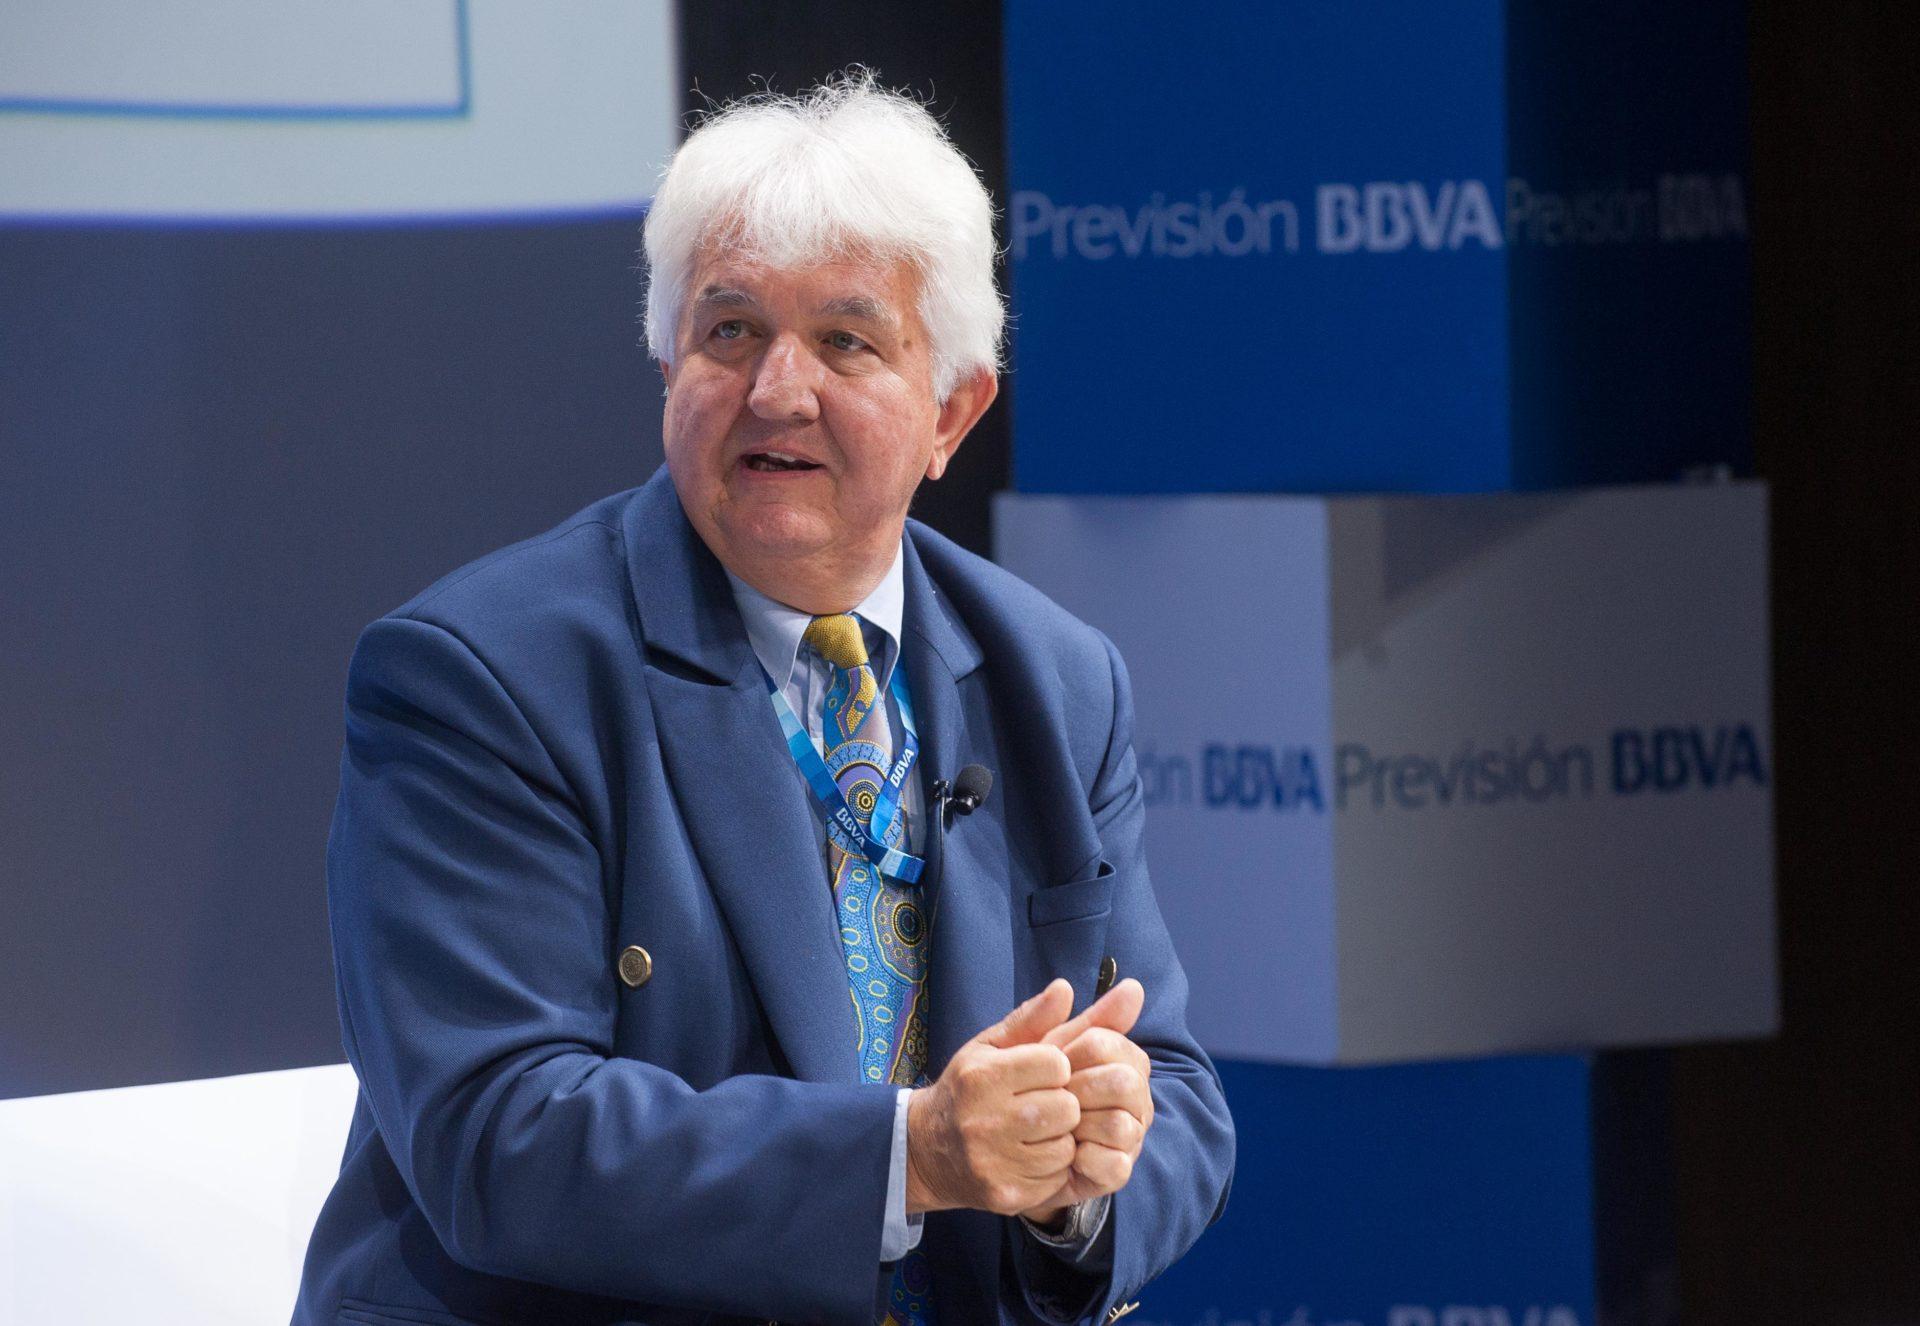 Fotografia de foro expertos pensiones economia jubilacion BBVA